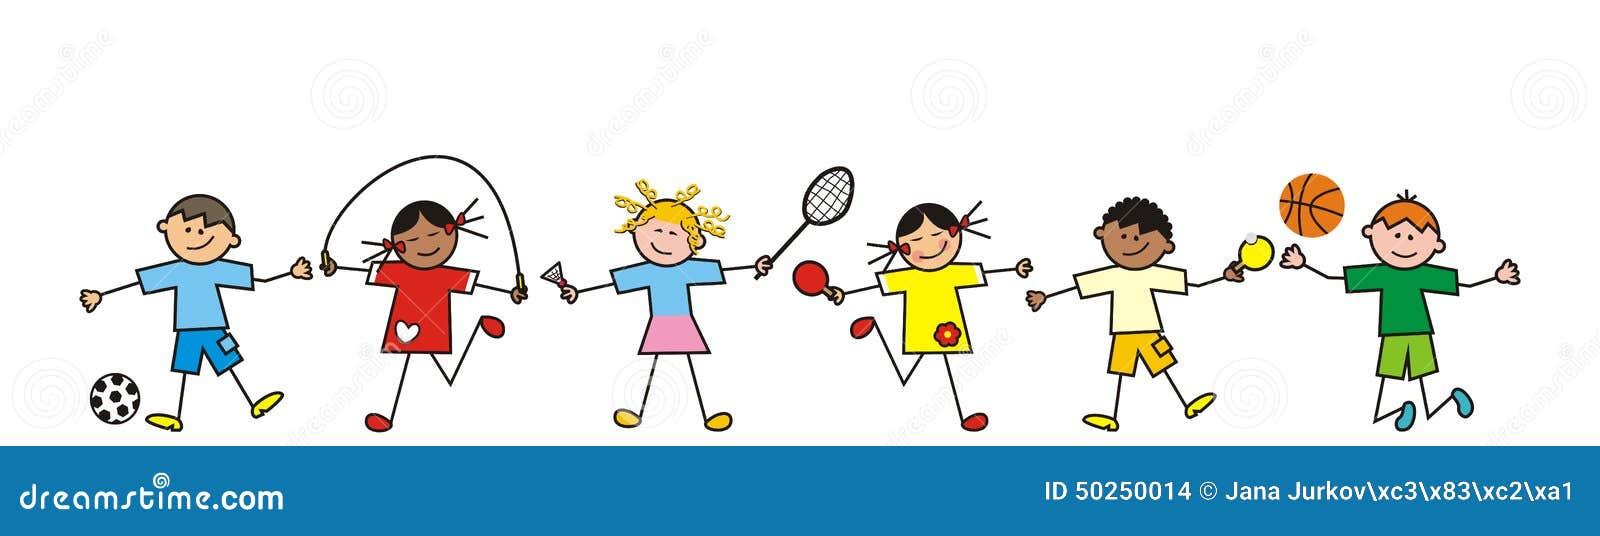 Set Of Cartoon Childrens Faces Stock Vector Art More: Children, Line Stock Vector